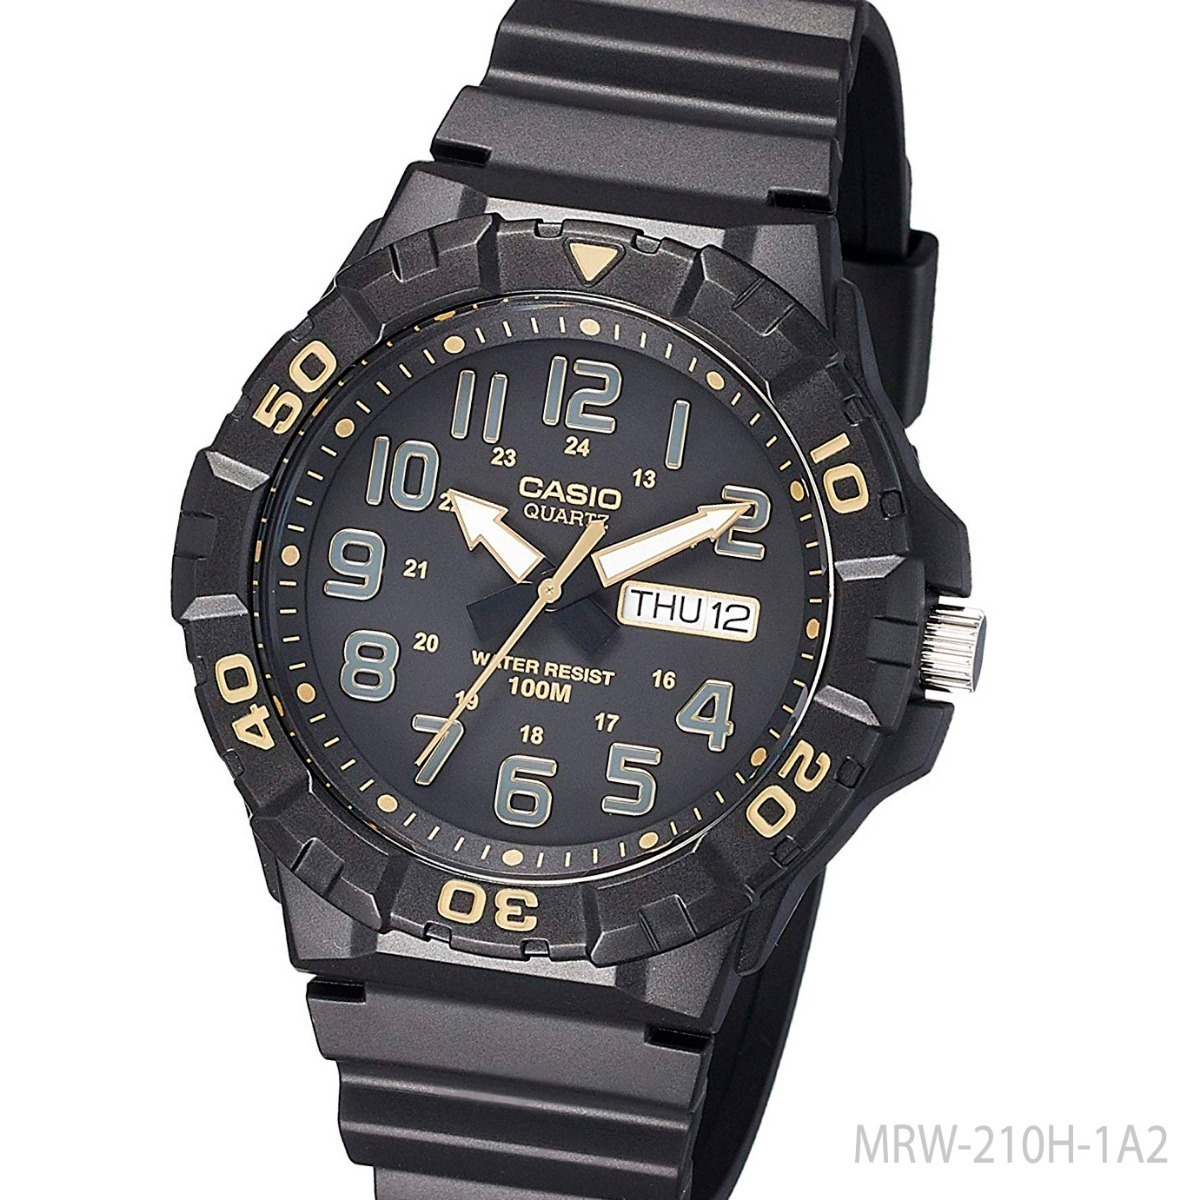 17bbbc11f24a Reloj Casio Hombre Mrw-210h-1a2v Wr 100mts